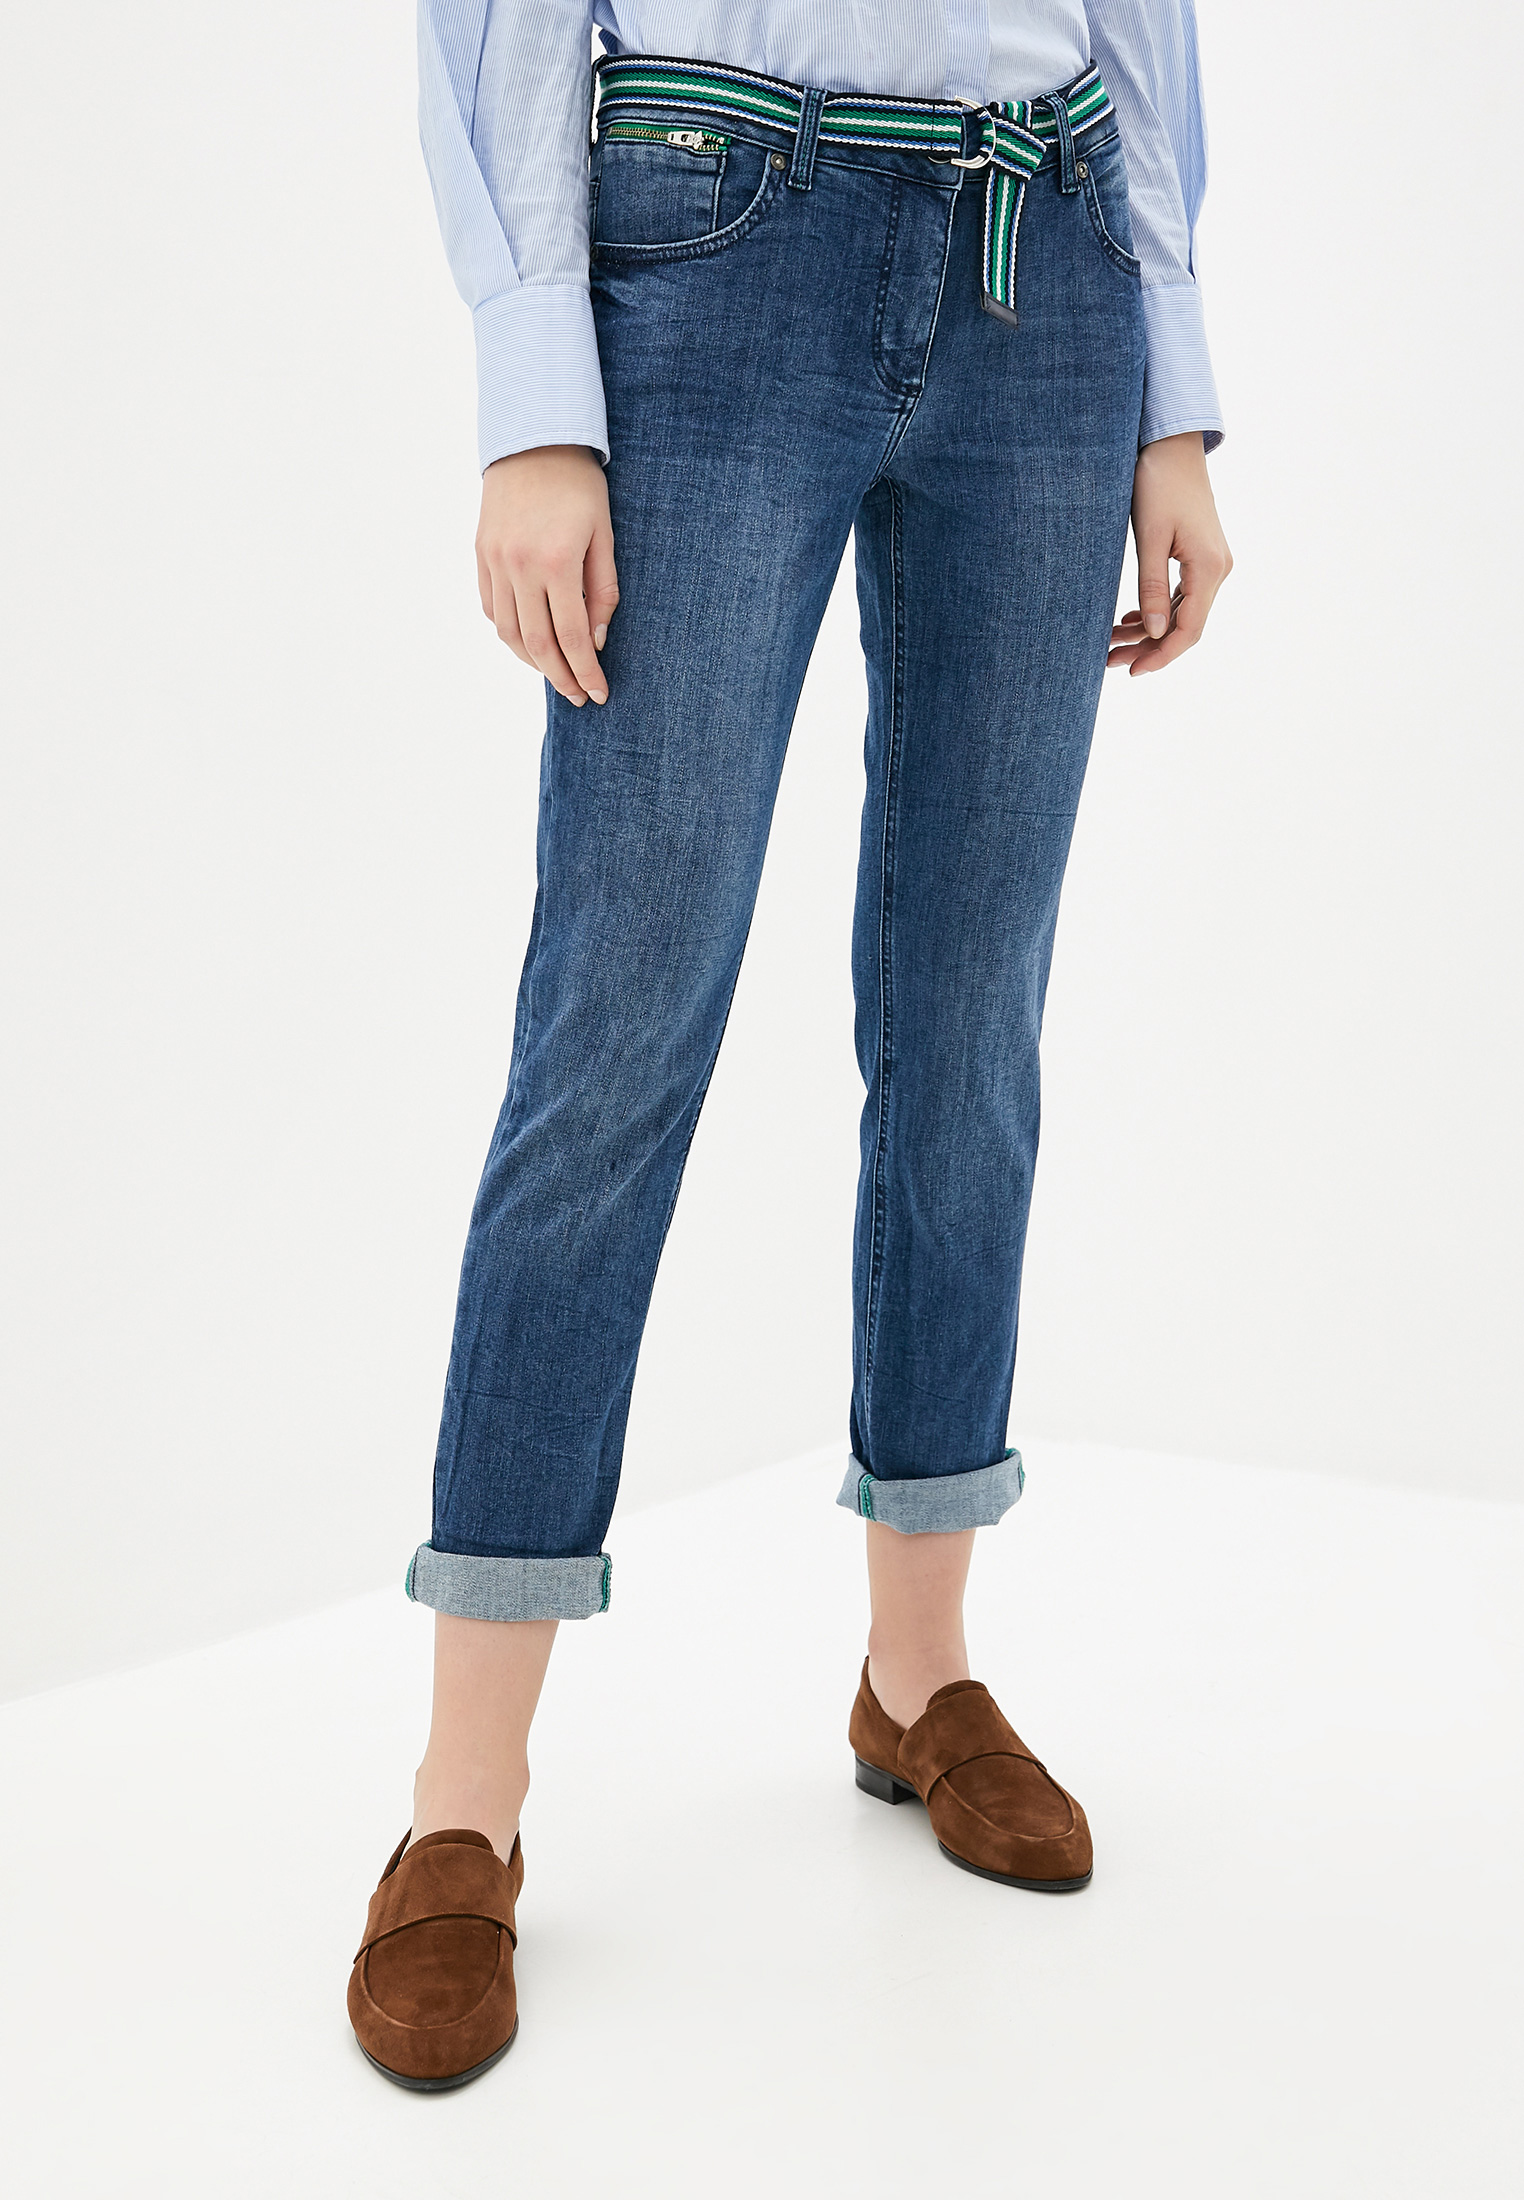 Женские джинсы Betty Barclay 6034/1065